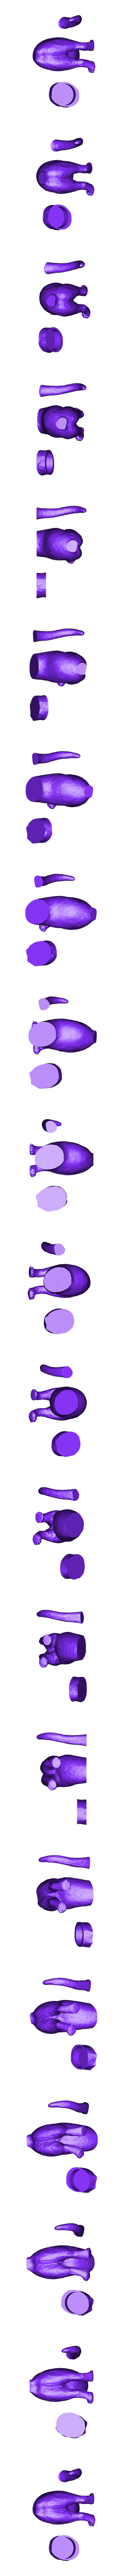 Cat_Magnet_Small.stl Download free STL file Cat Fridge Magnet • 3D printer model, milasls